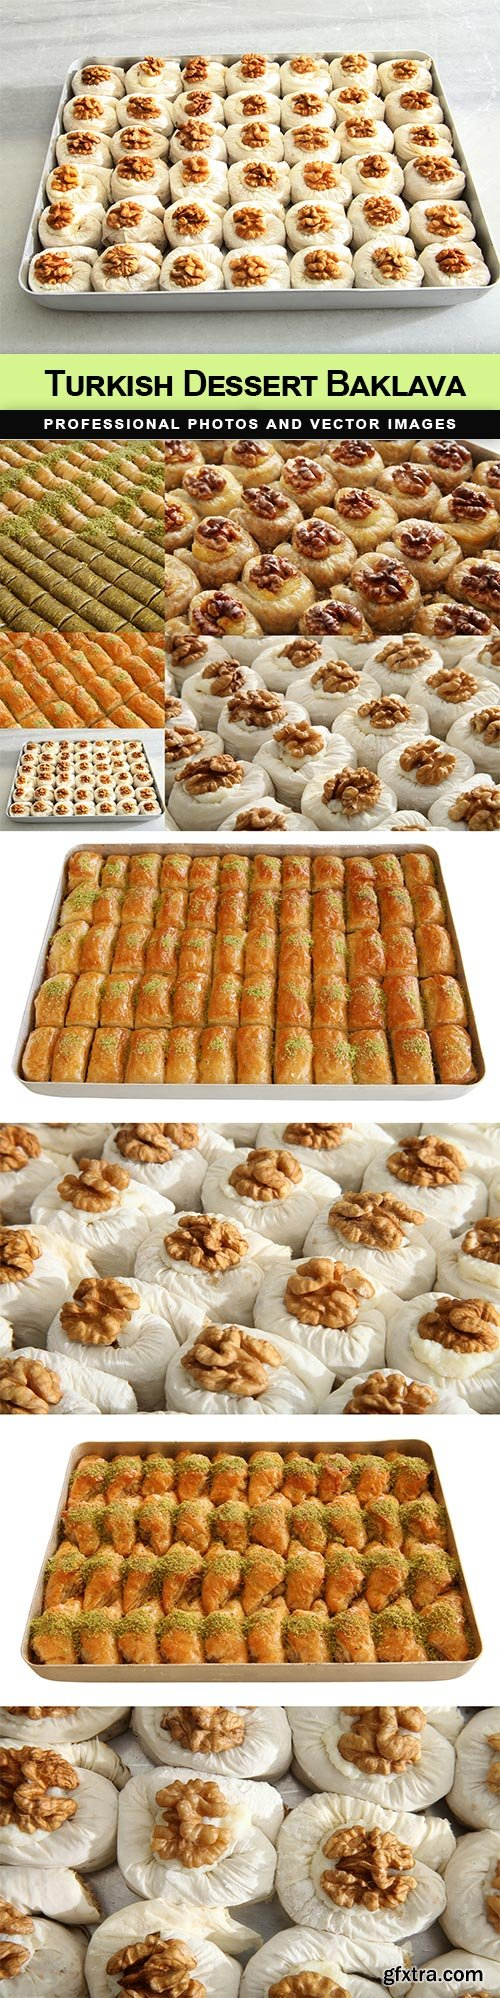 Turkish Dessert Baklava - 10 UHQ JPEG